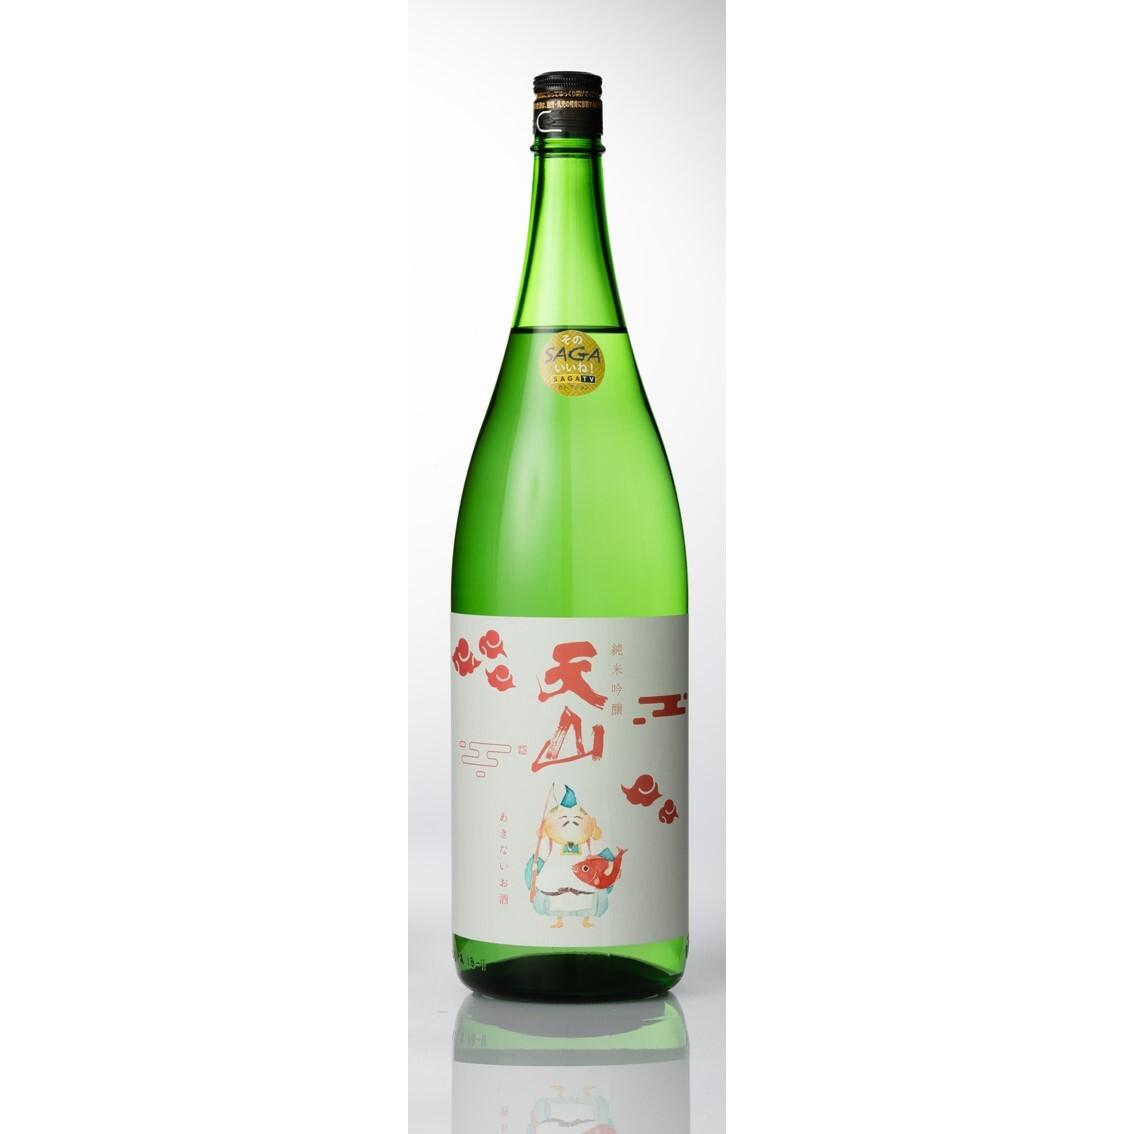 天山 純米吟醸恵比寿ラベル 1800ml